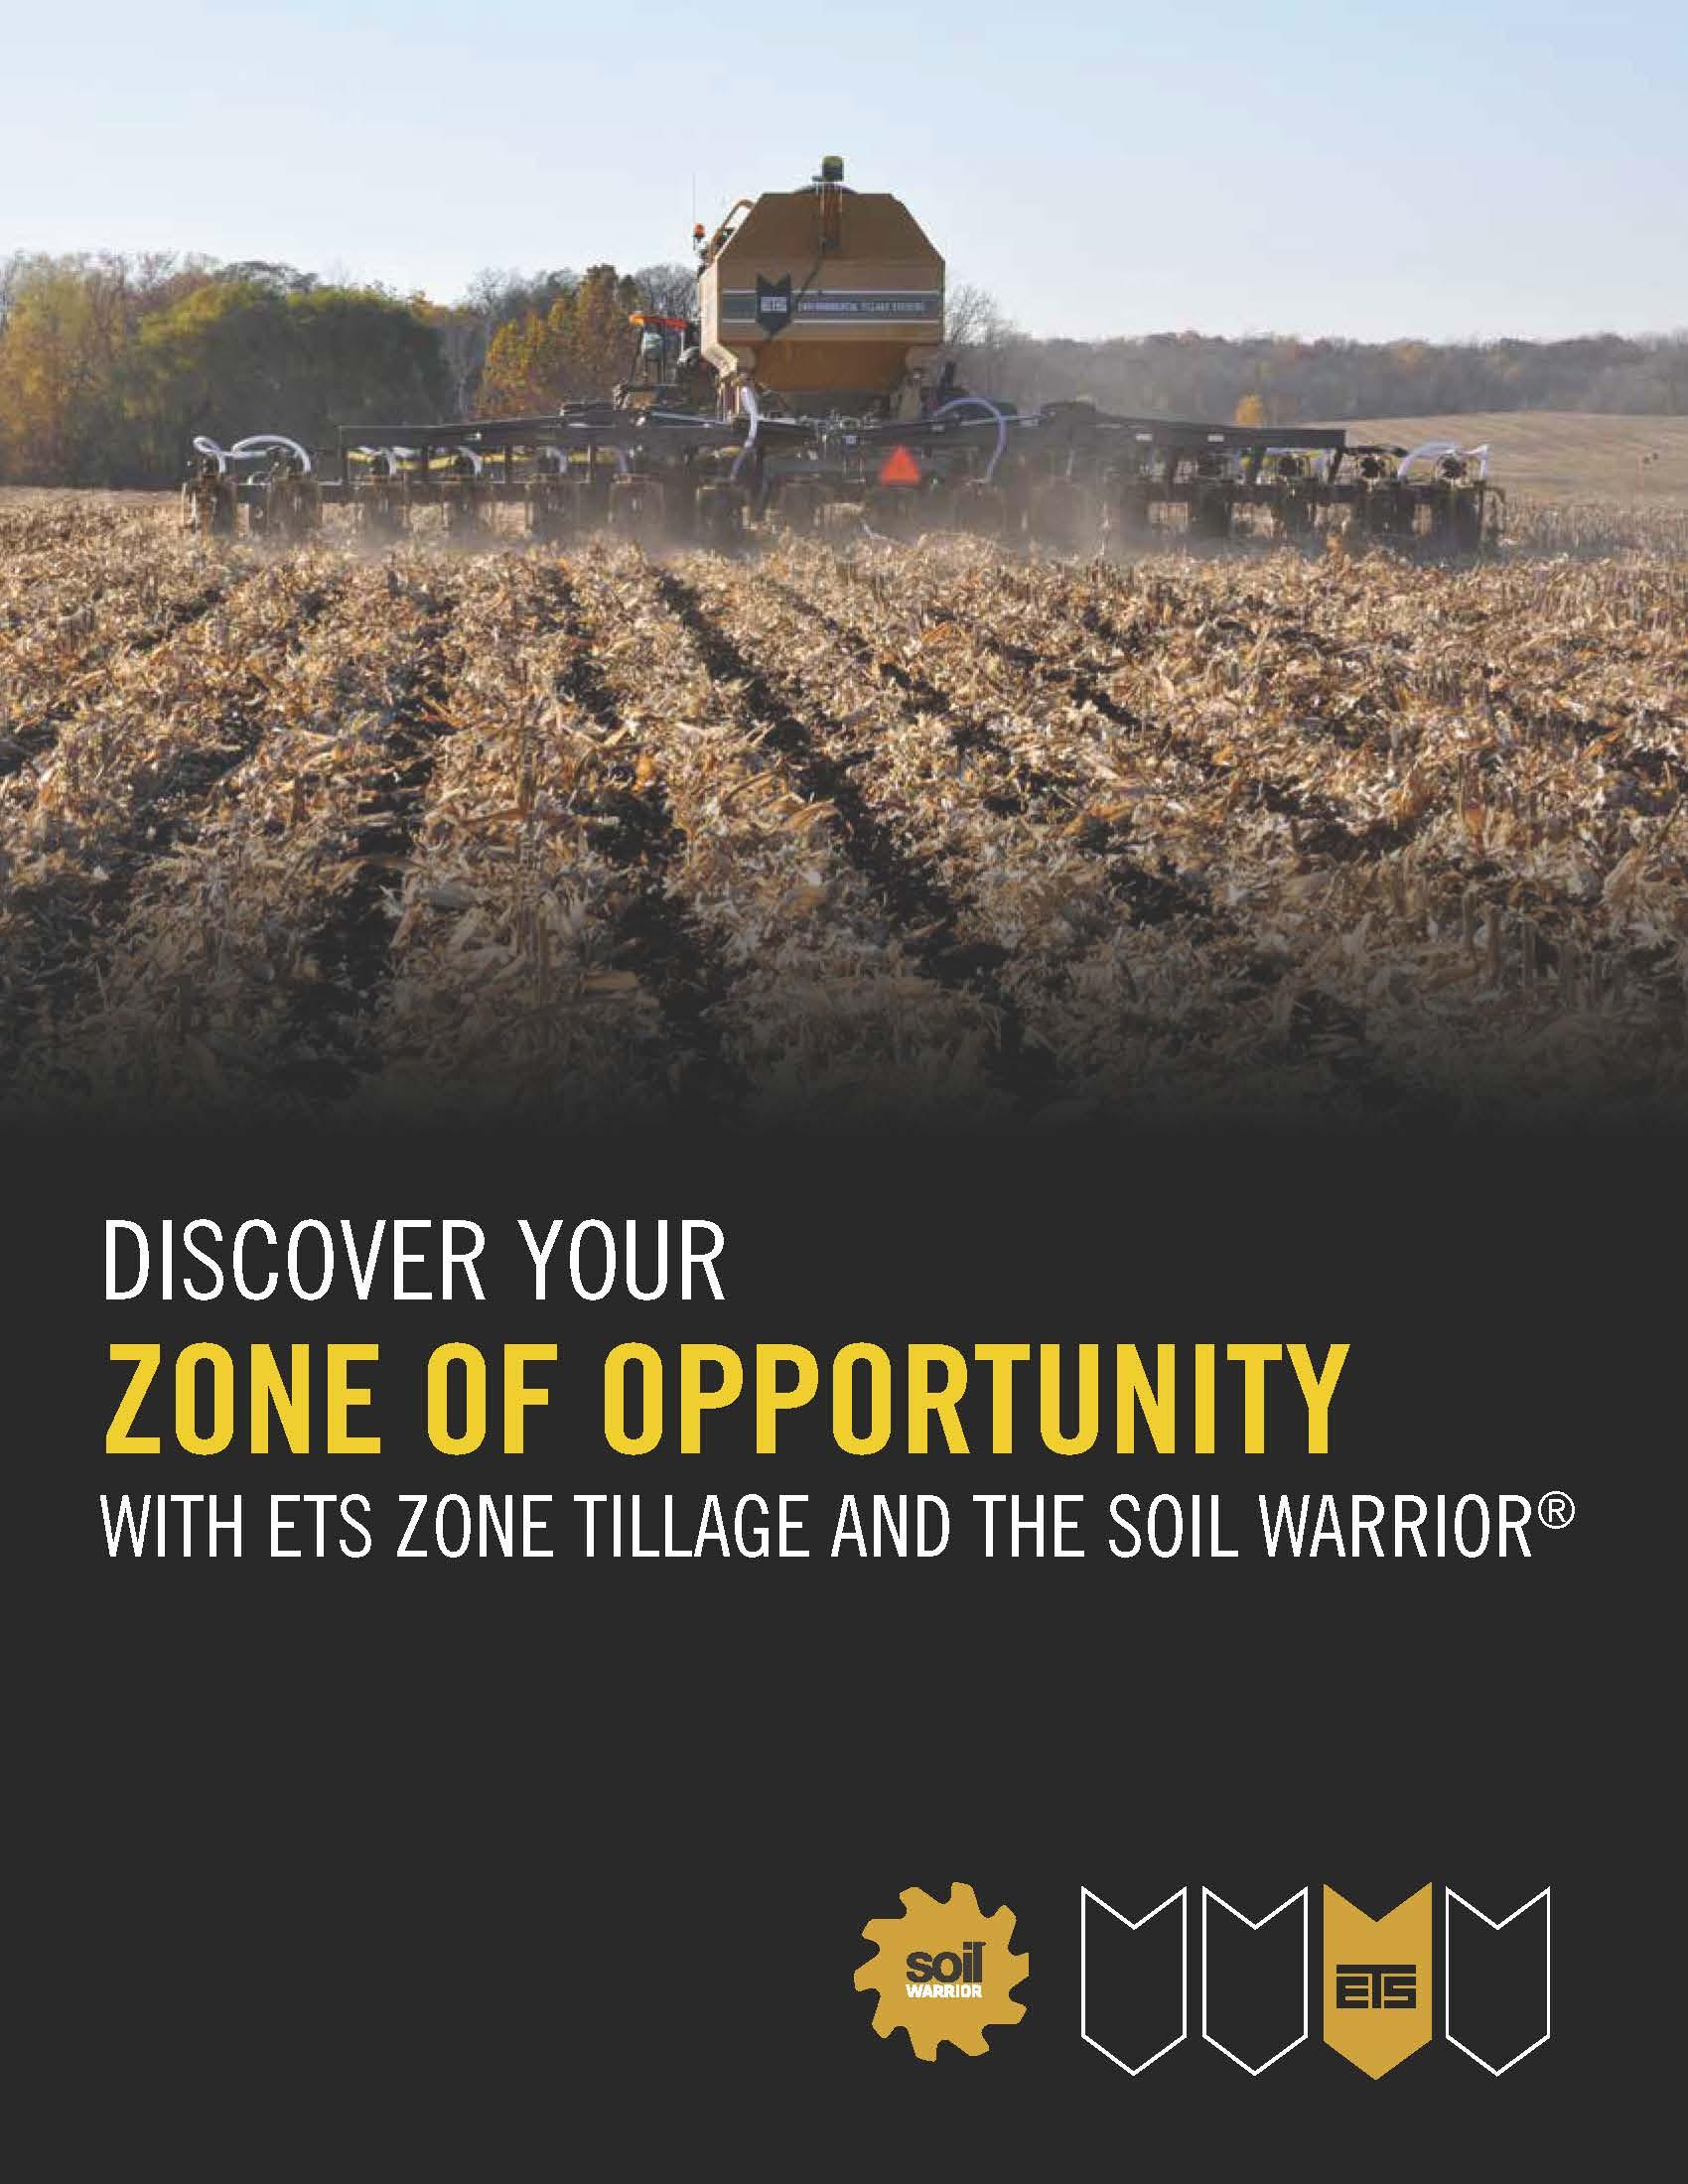 ETS_SoilWarrior_ebook_2016_cover.jpg